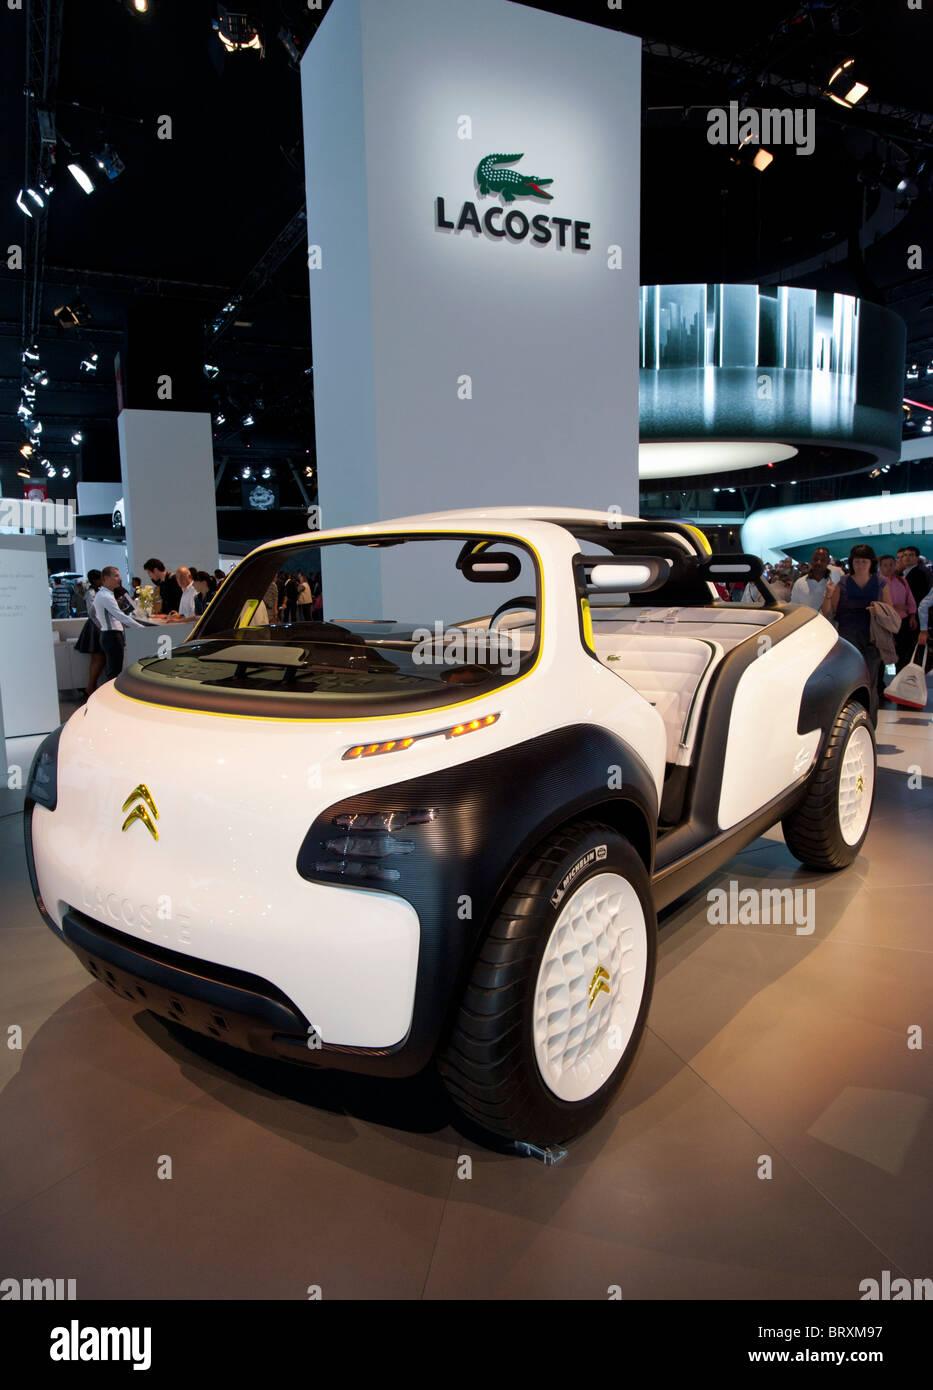 Citroën Lacoste concept vehículo en Paris Motor Show 2010 Imagen De Stock